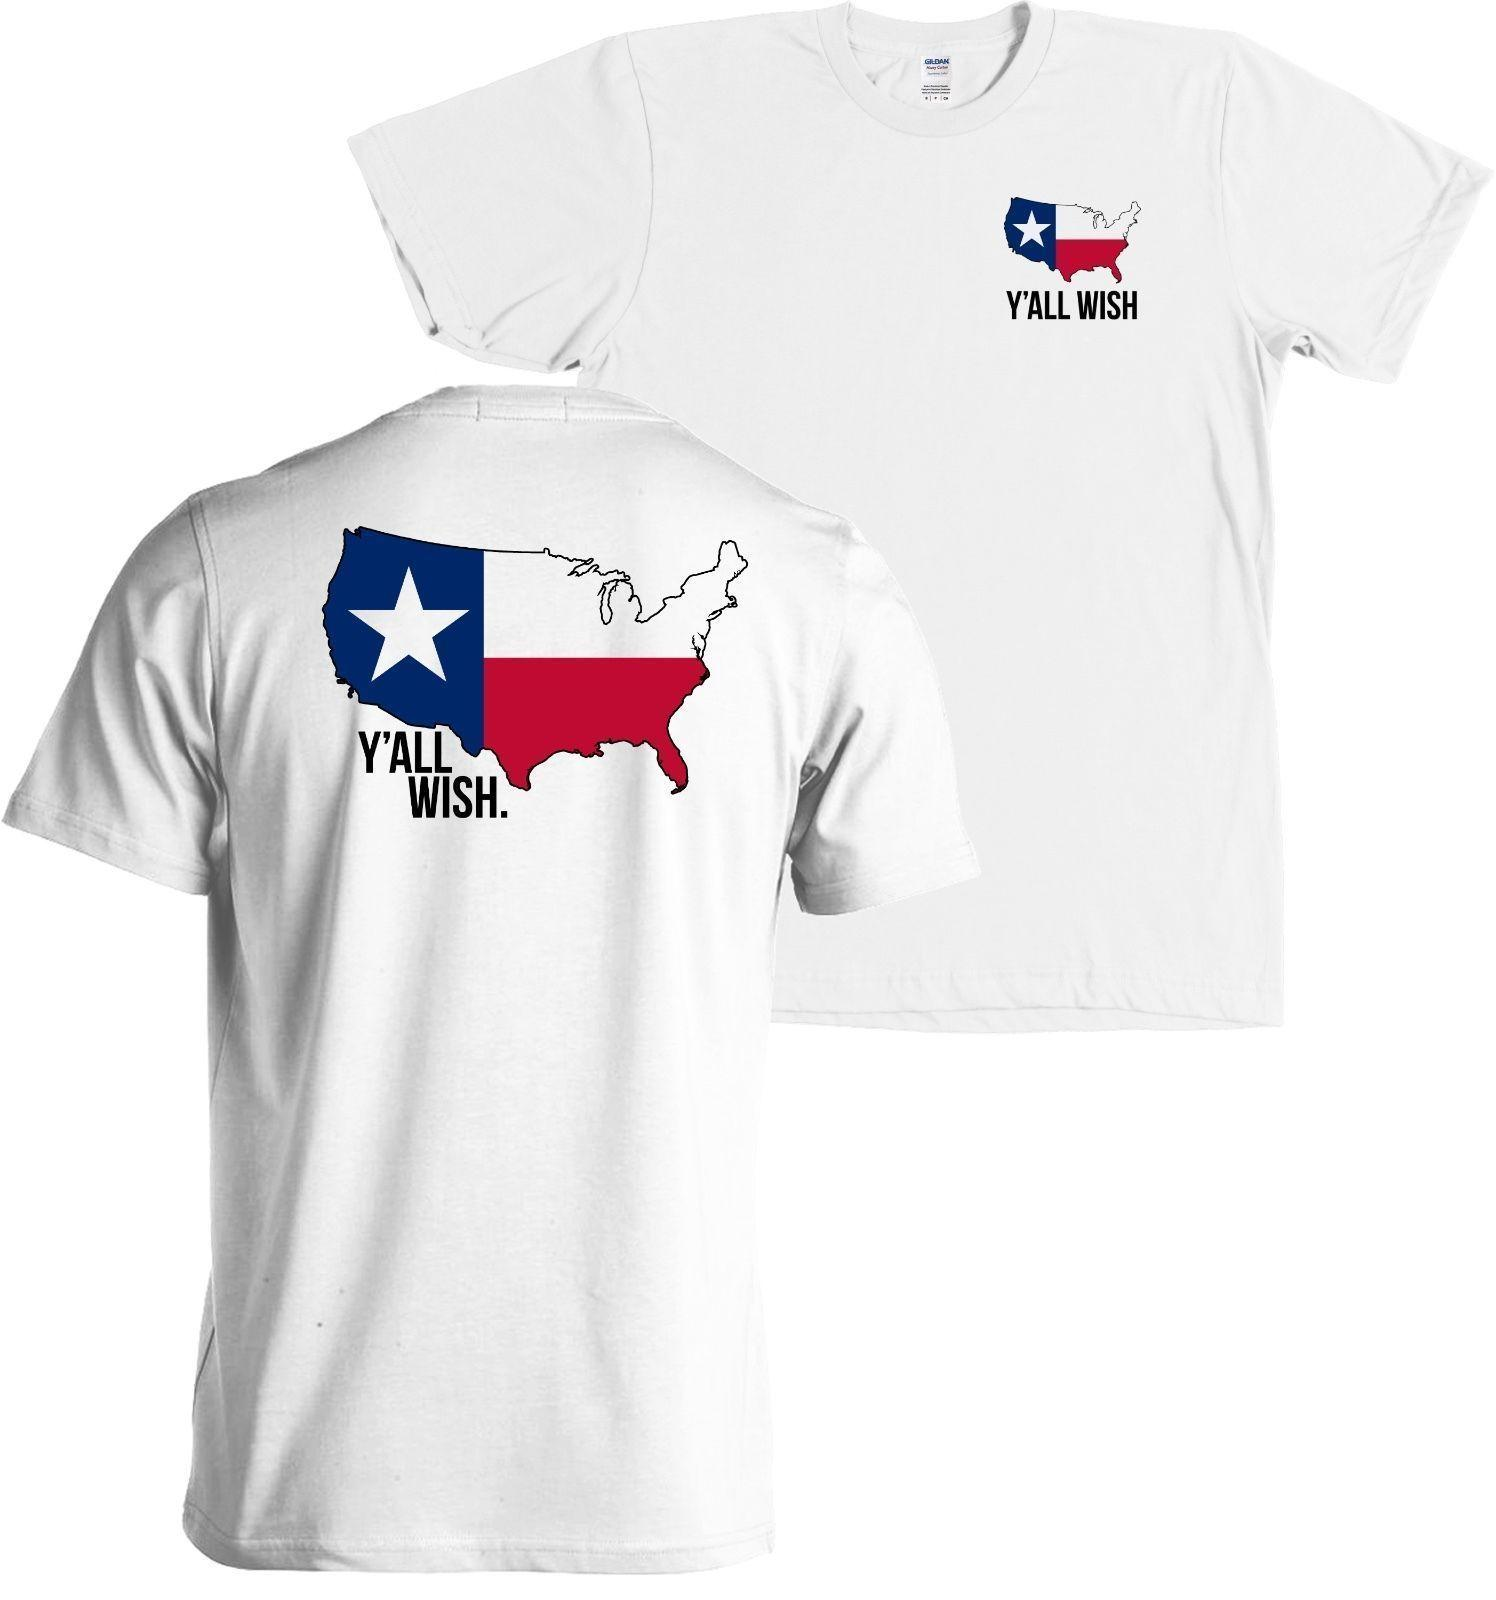 2020 En Yeni Harf Baskı Karikatür Y Tüm İstek Texas Amerikan Harita Anahat Toptan T Gömlek